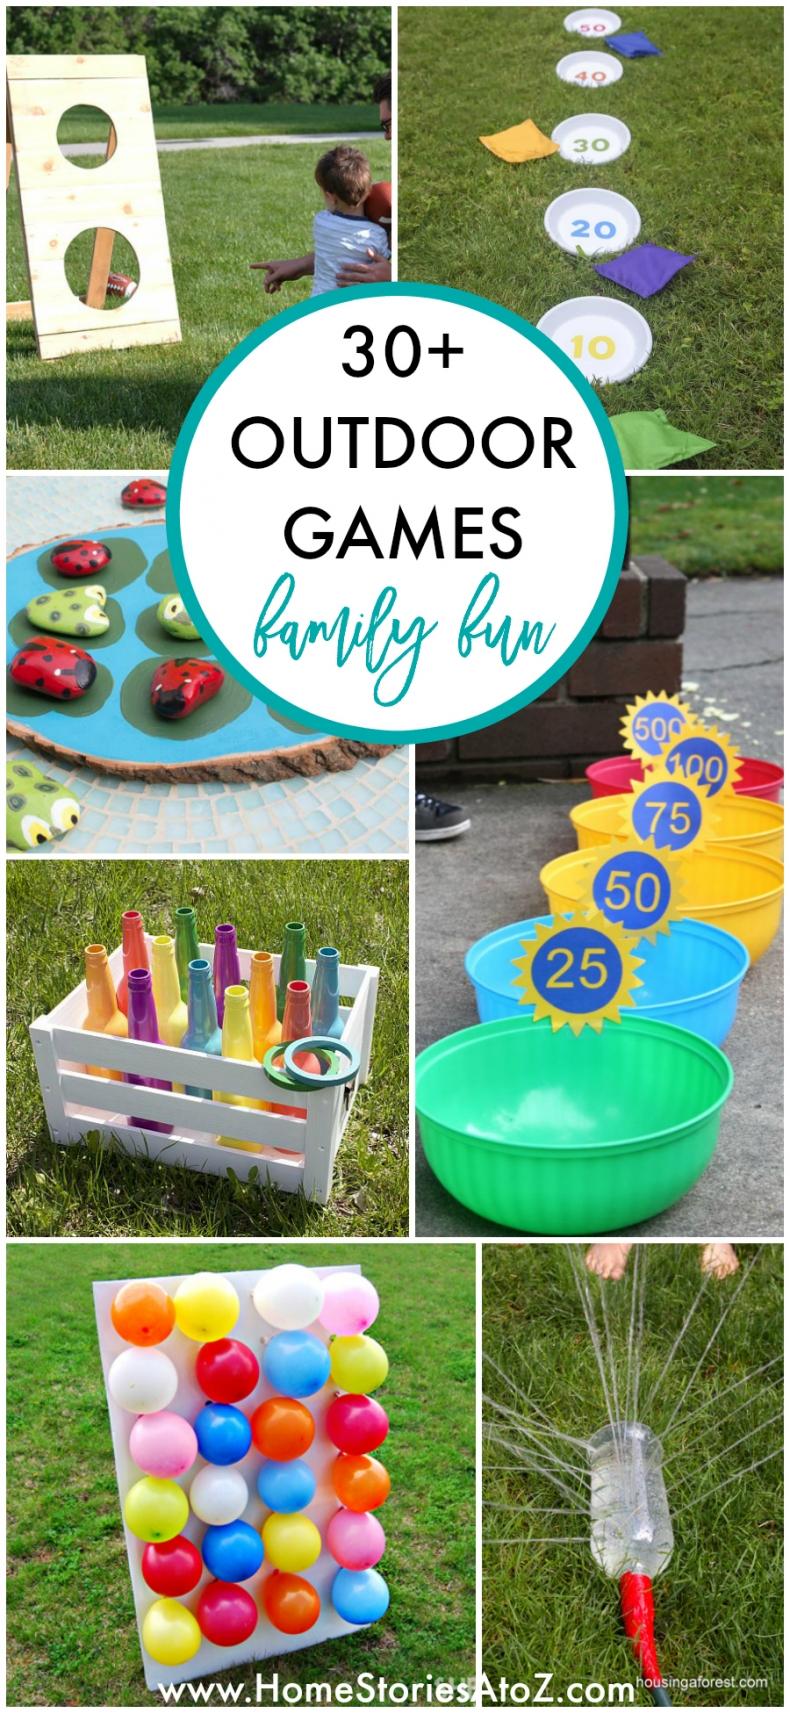 30+ DIY Fun Games for Outdoors